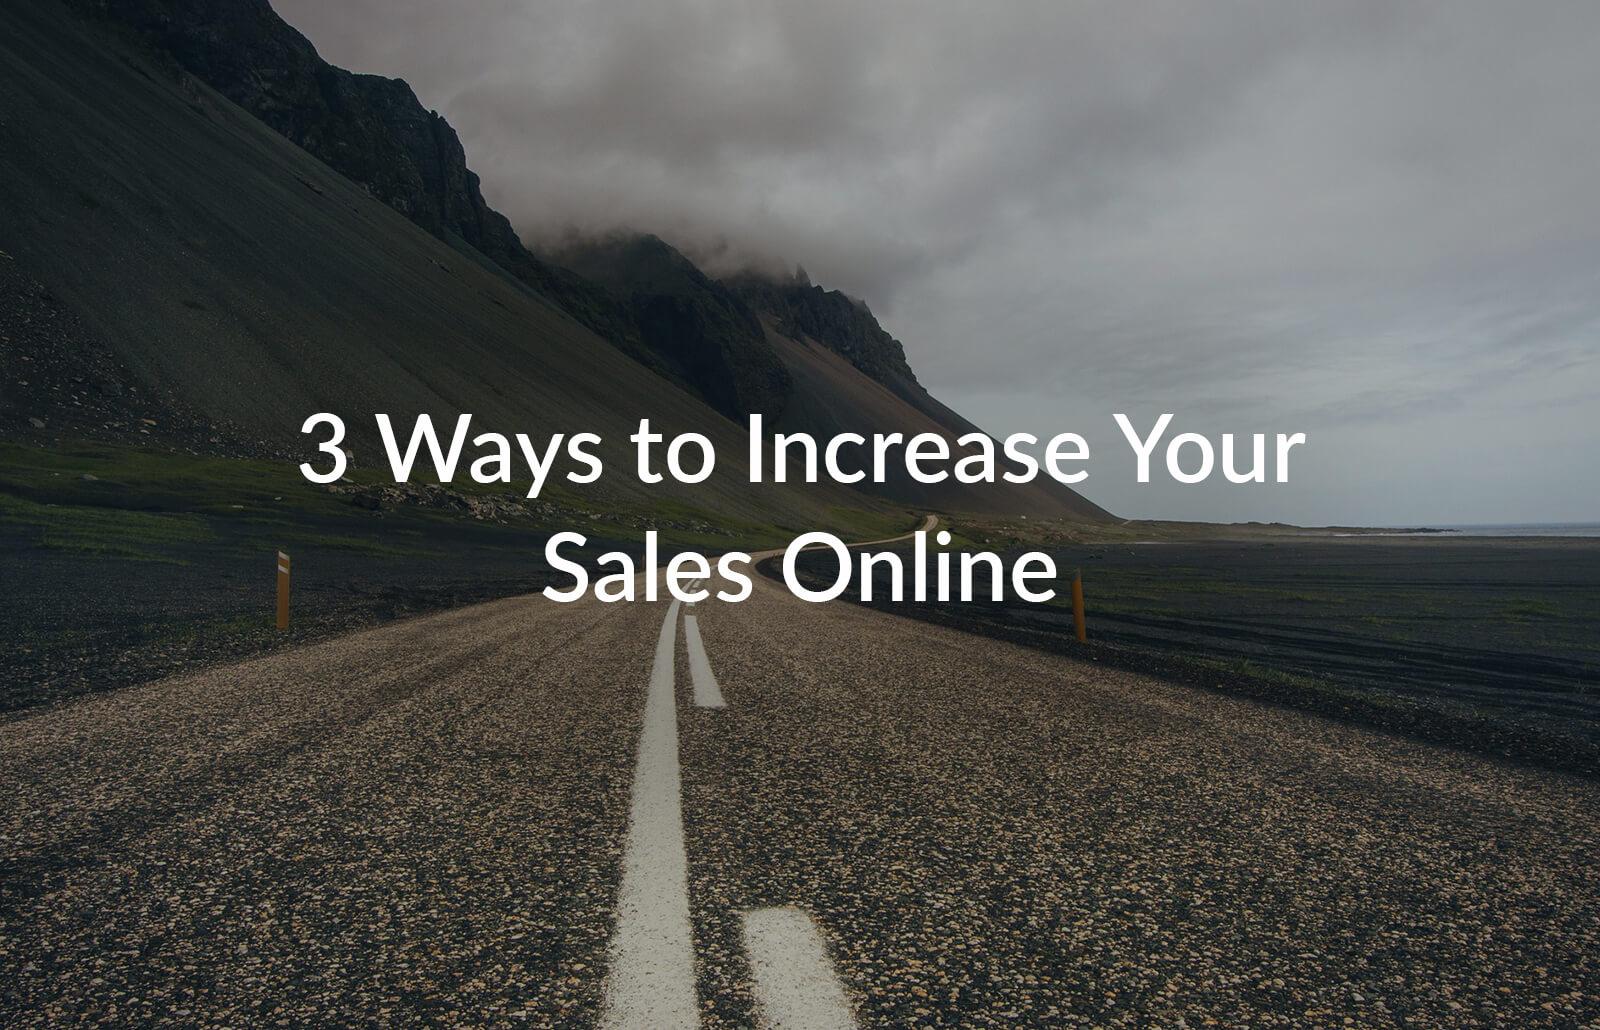 3 Ways to Increase Your Sales Online